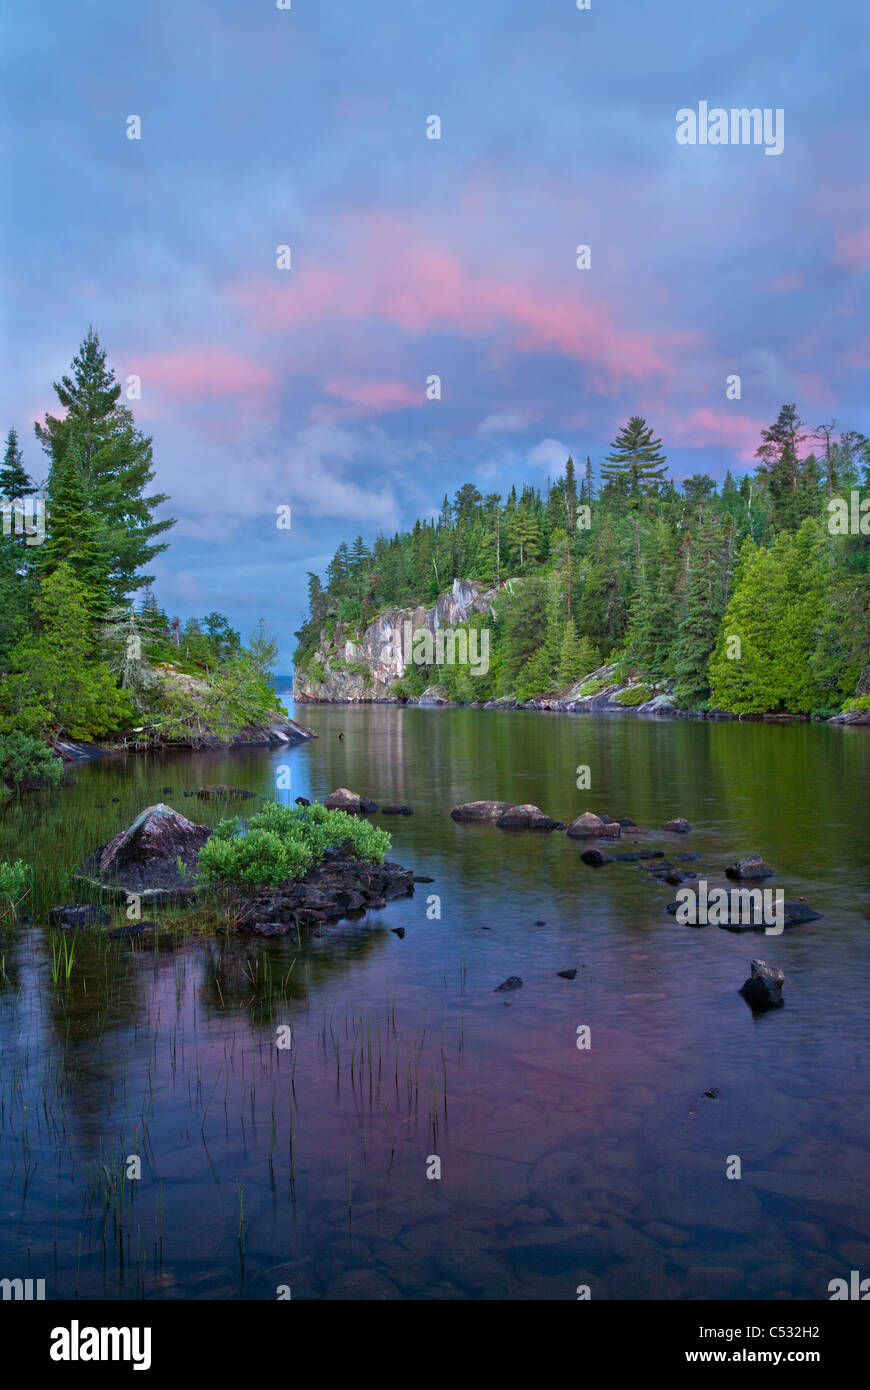 Sea Gull Lake at sunrise, Boundary Waters Canoe Area Wilderness, Superior National Forest, Minnesota - Stock Image